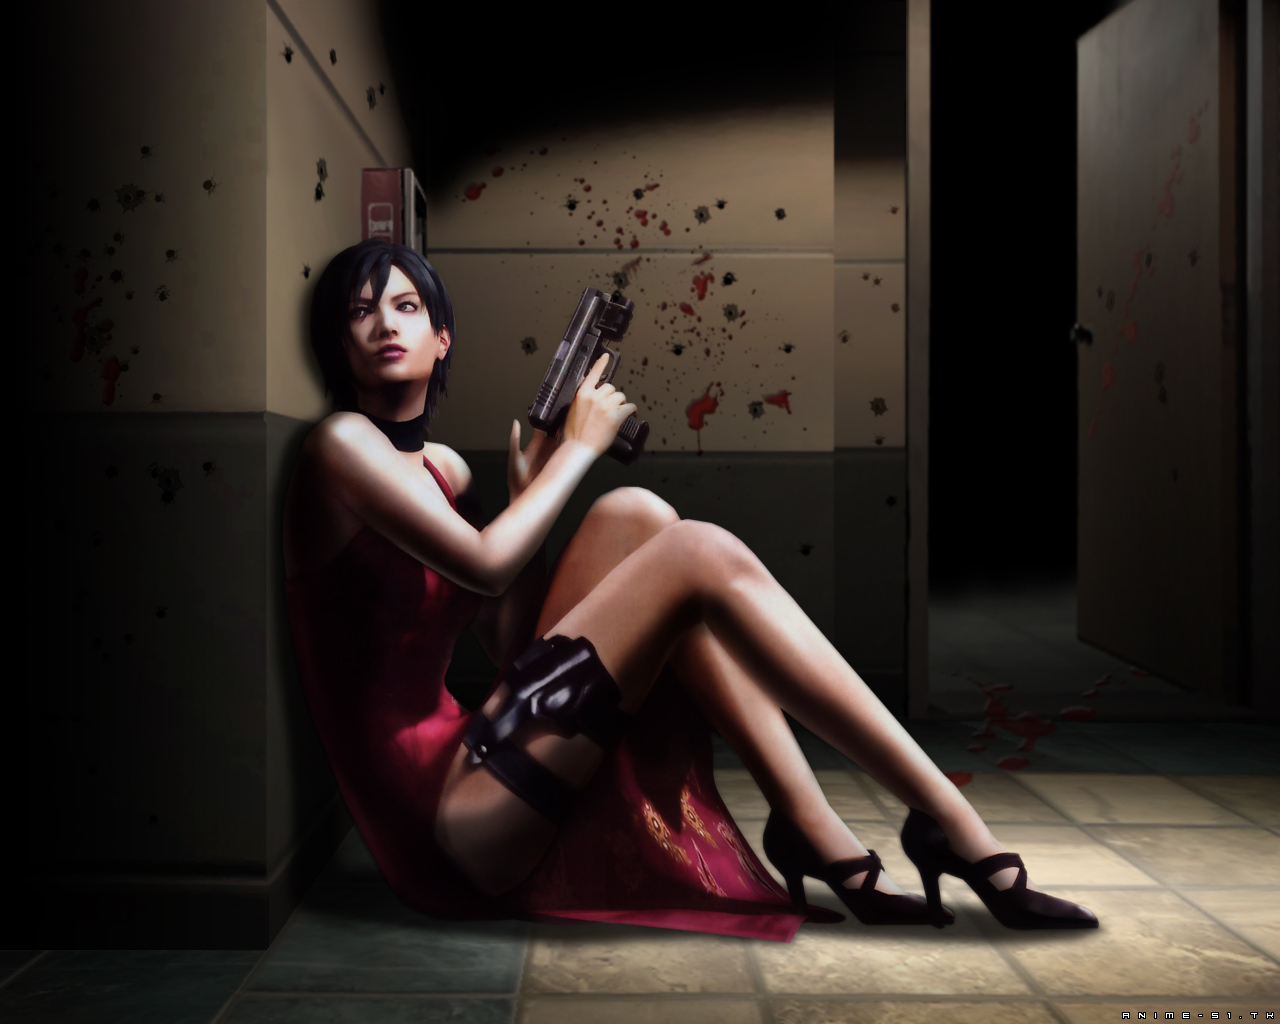 Evil girl xxx photos sexual scene